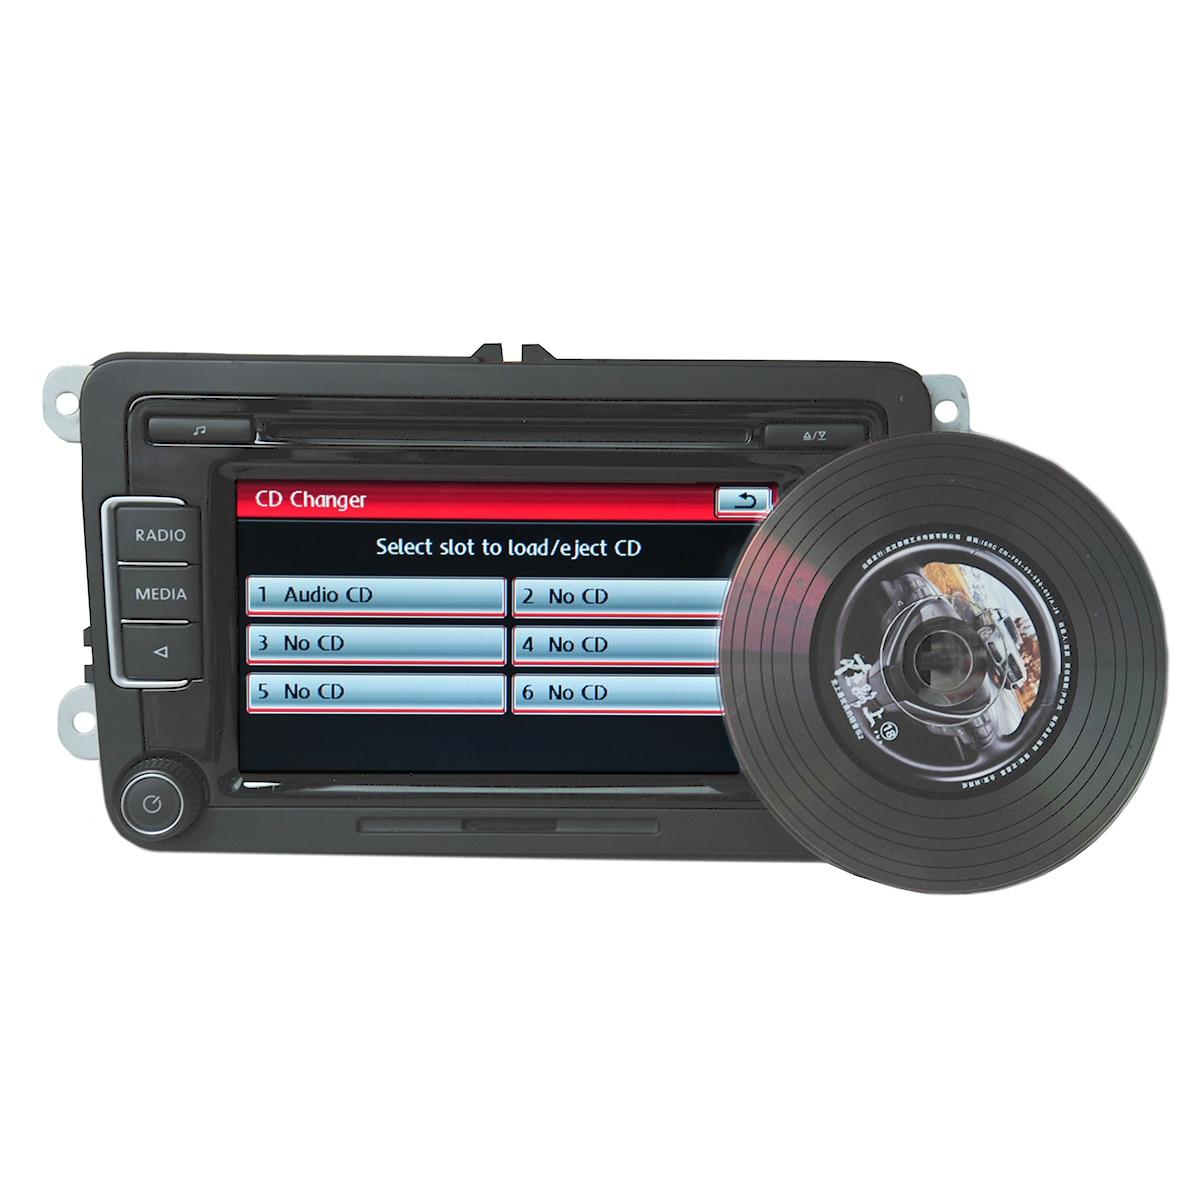 La Radio del coche RCD510 FM CD MP3 jugador AUX USB RVC/con código de cámara de visión trasera para VW Golf Passat CC Tiguan Polo Golf MK5 MK6 Jetta